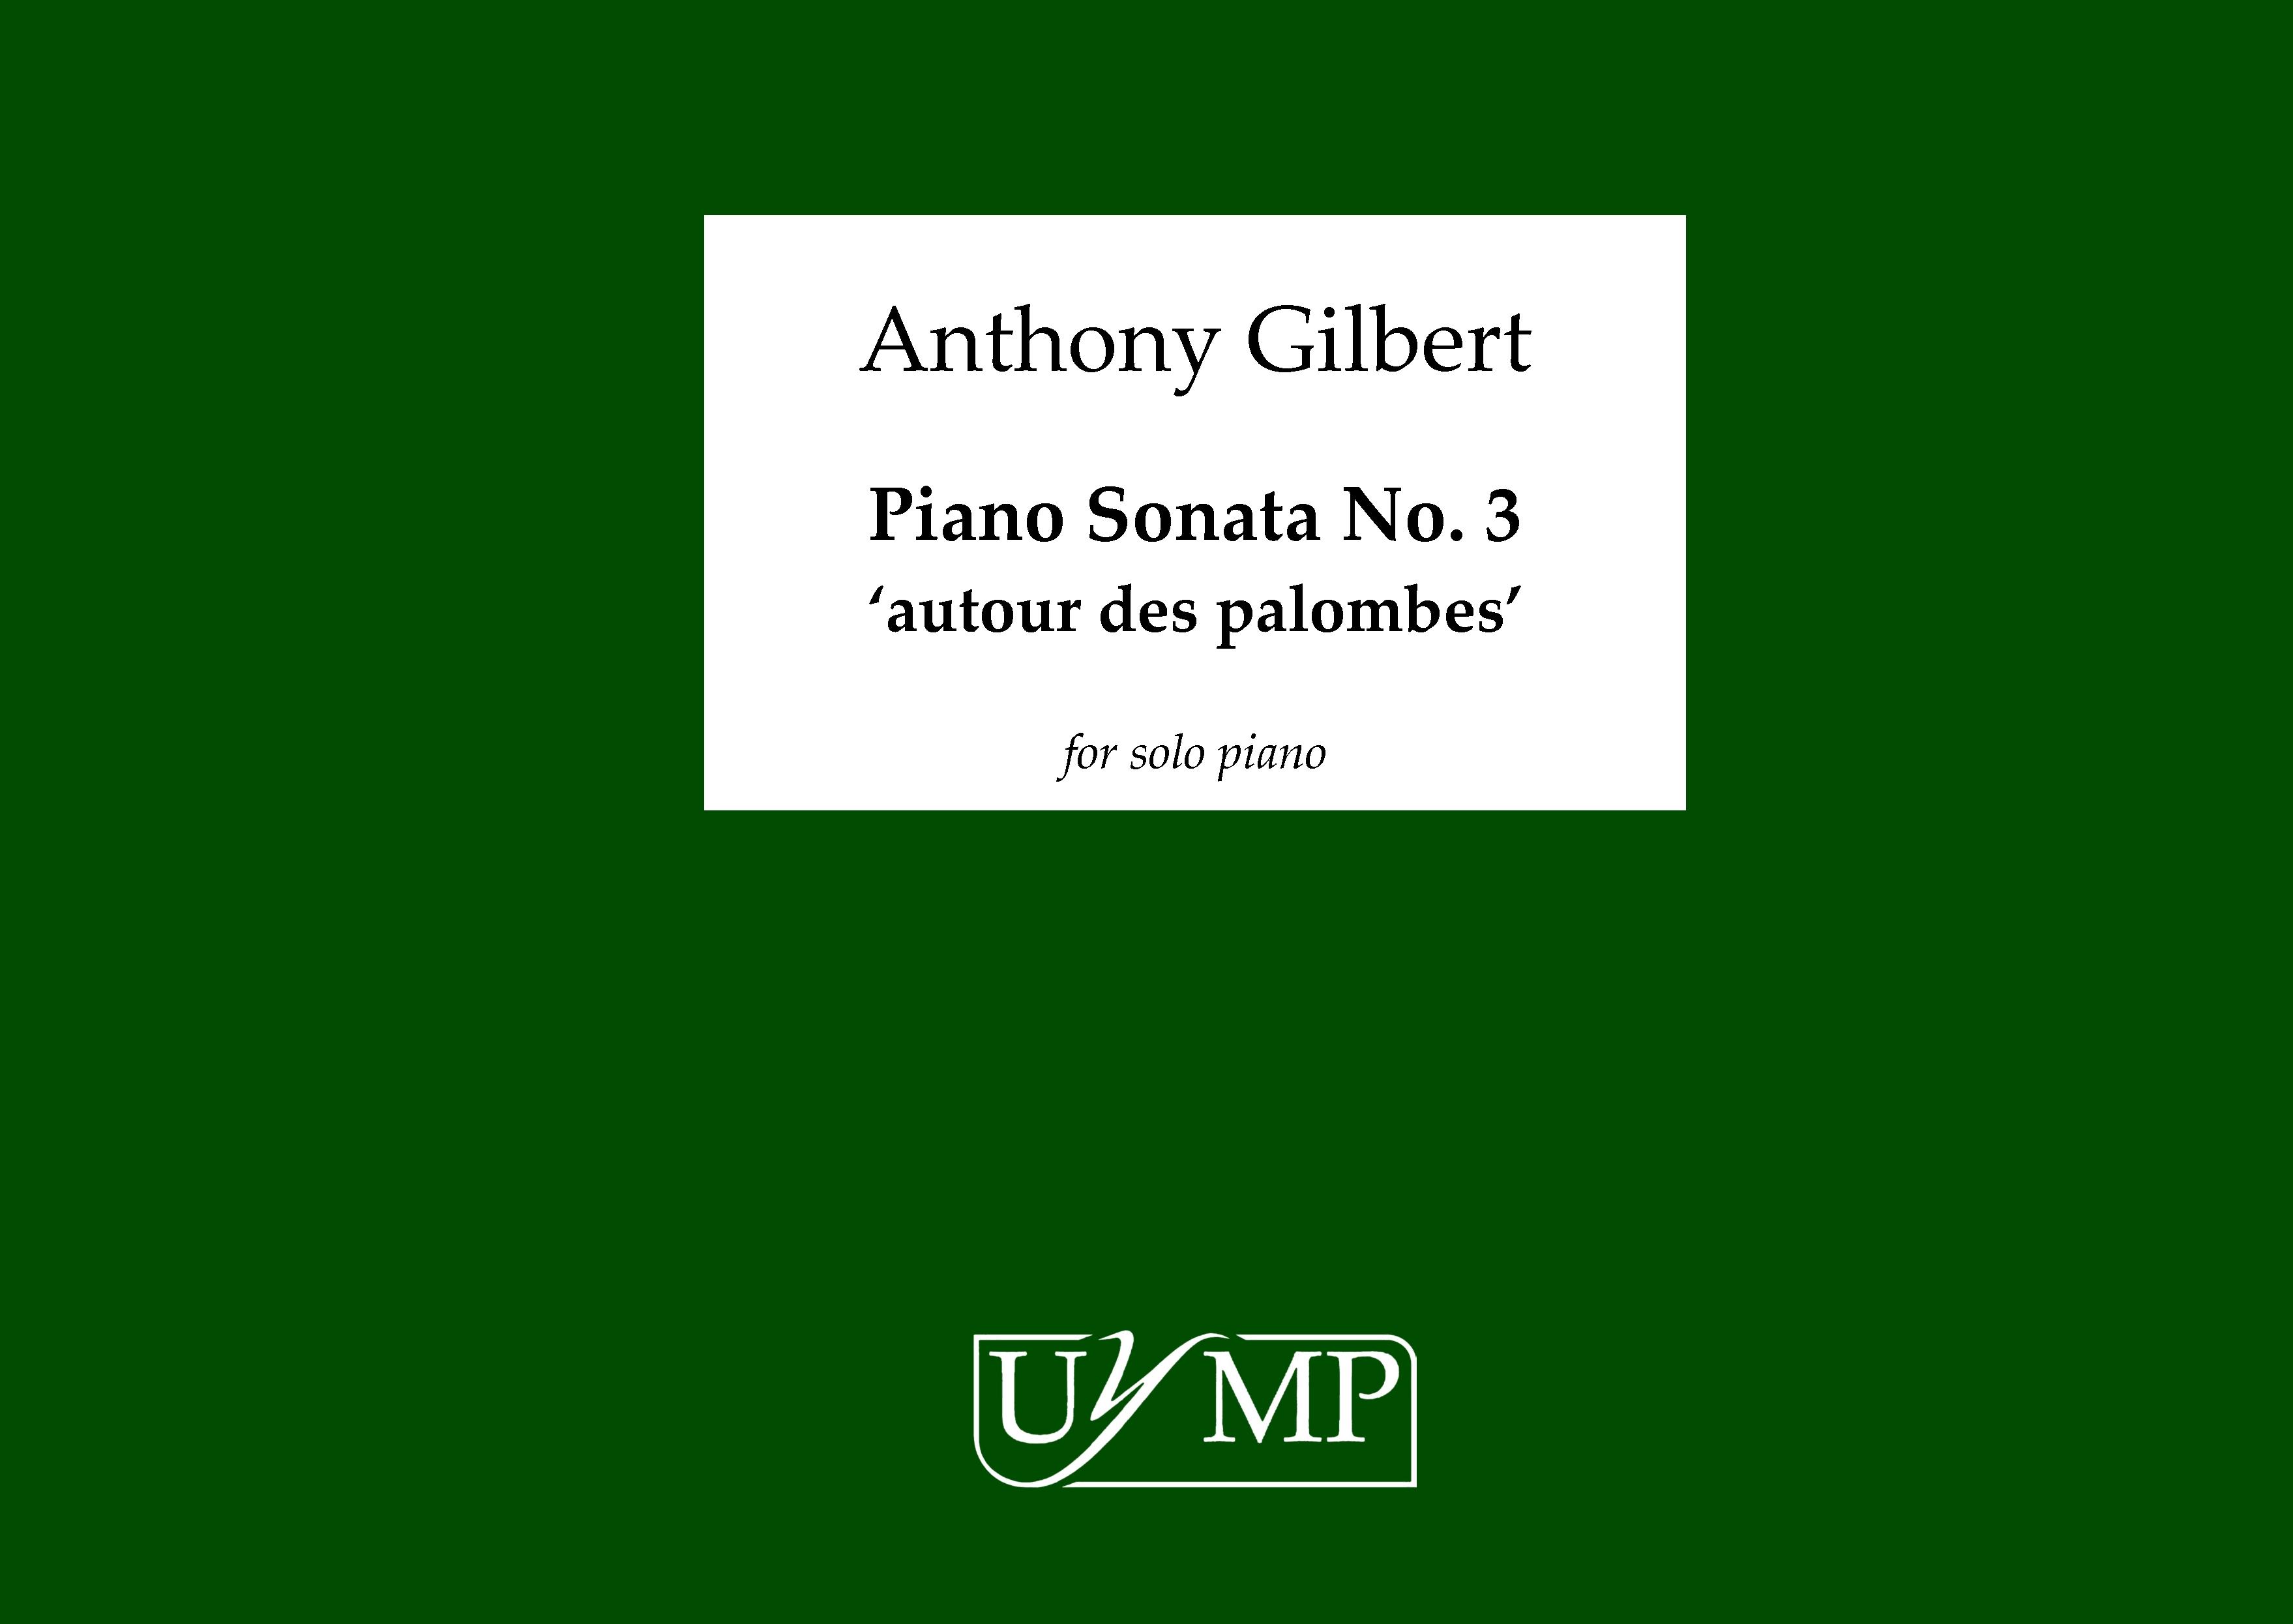 Anthony Gilbert: Piano Sonata No.3